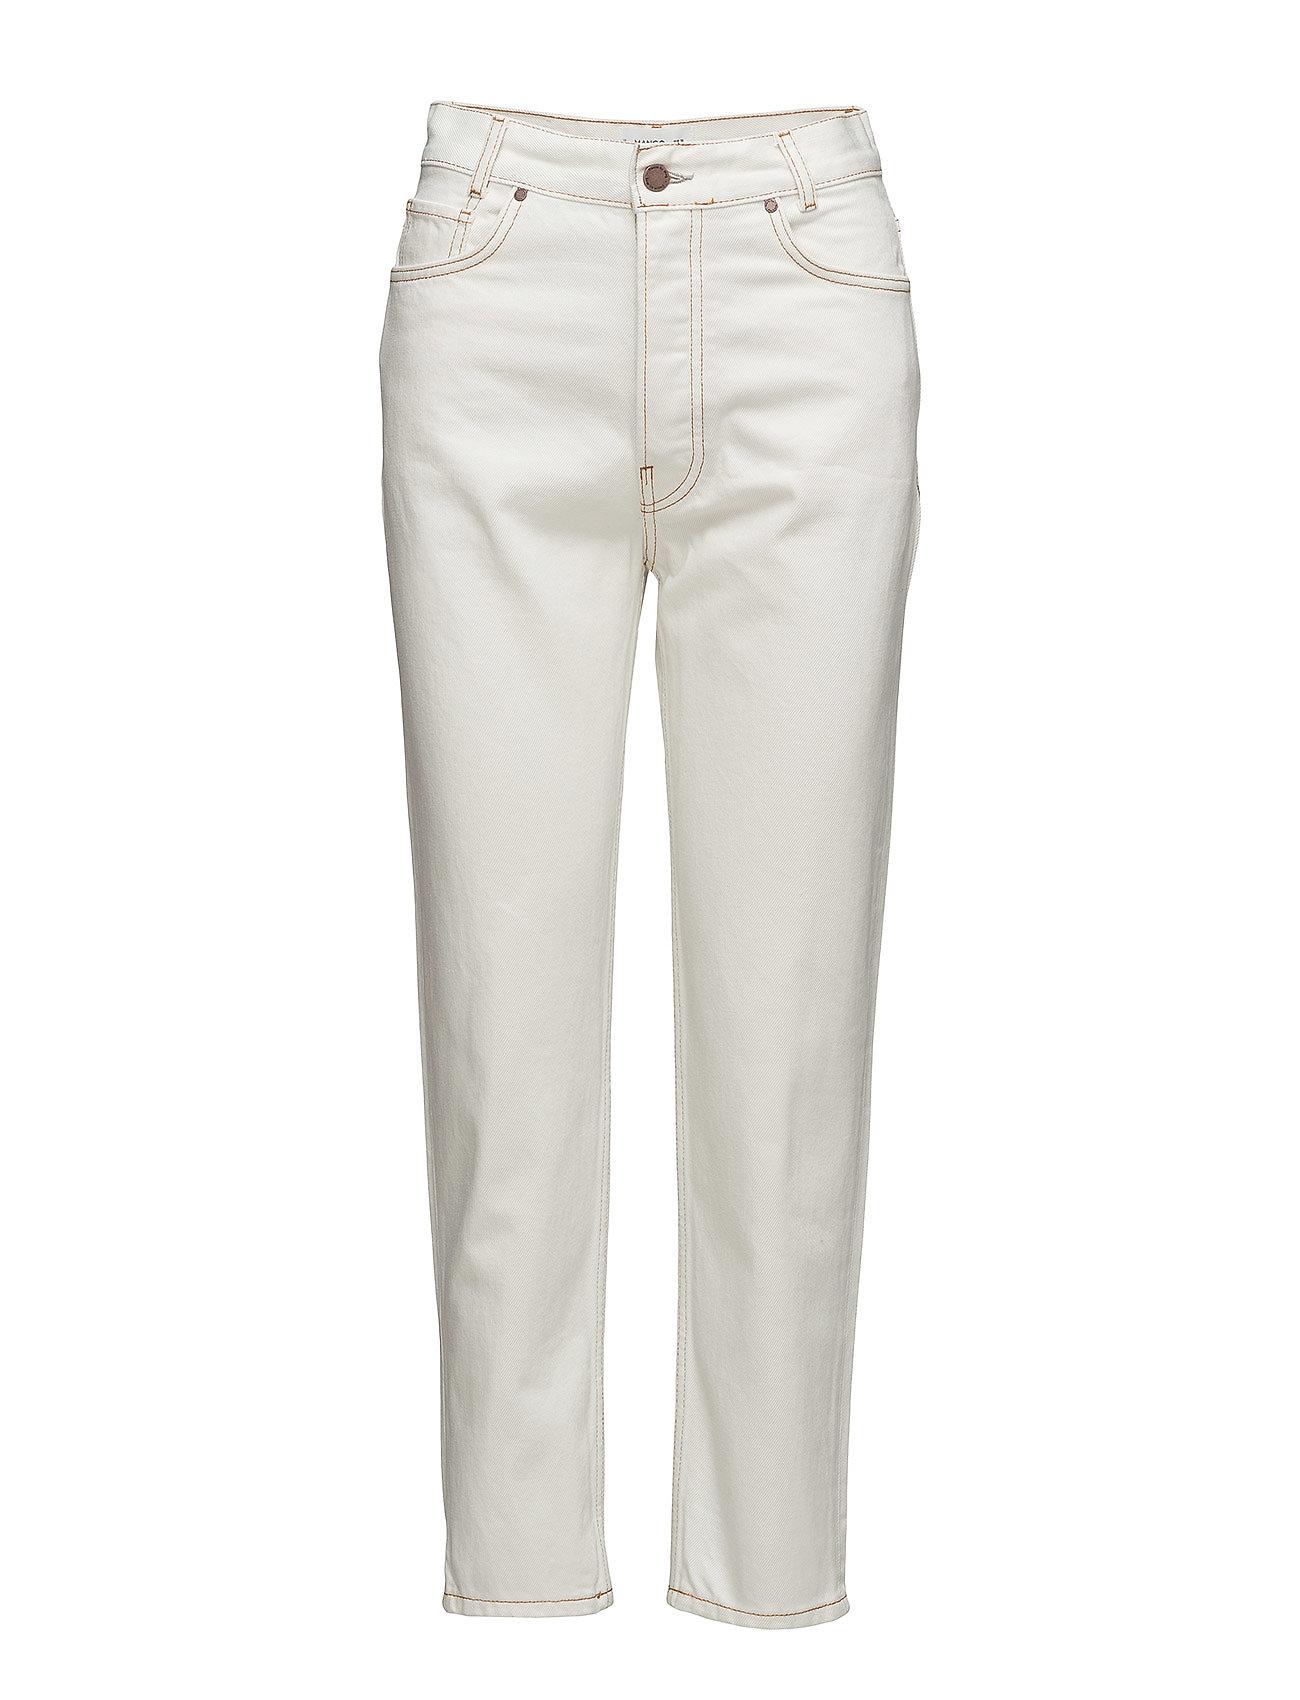 Mango Judith straight jeans